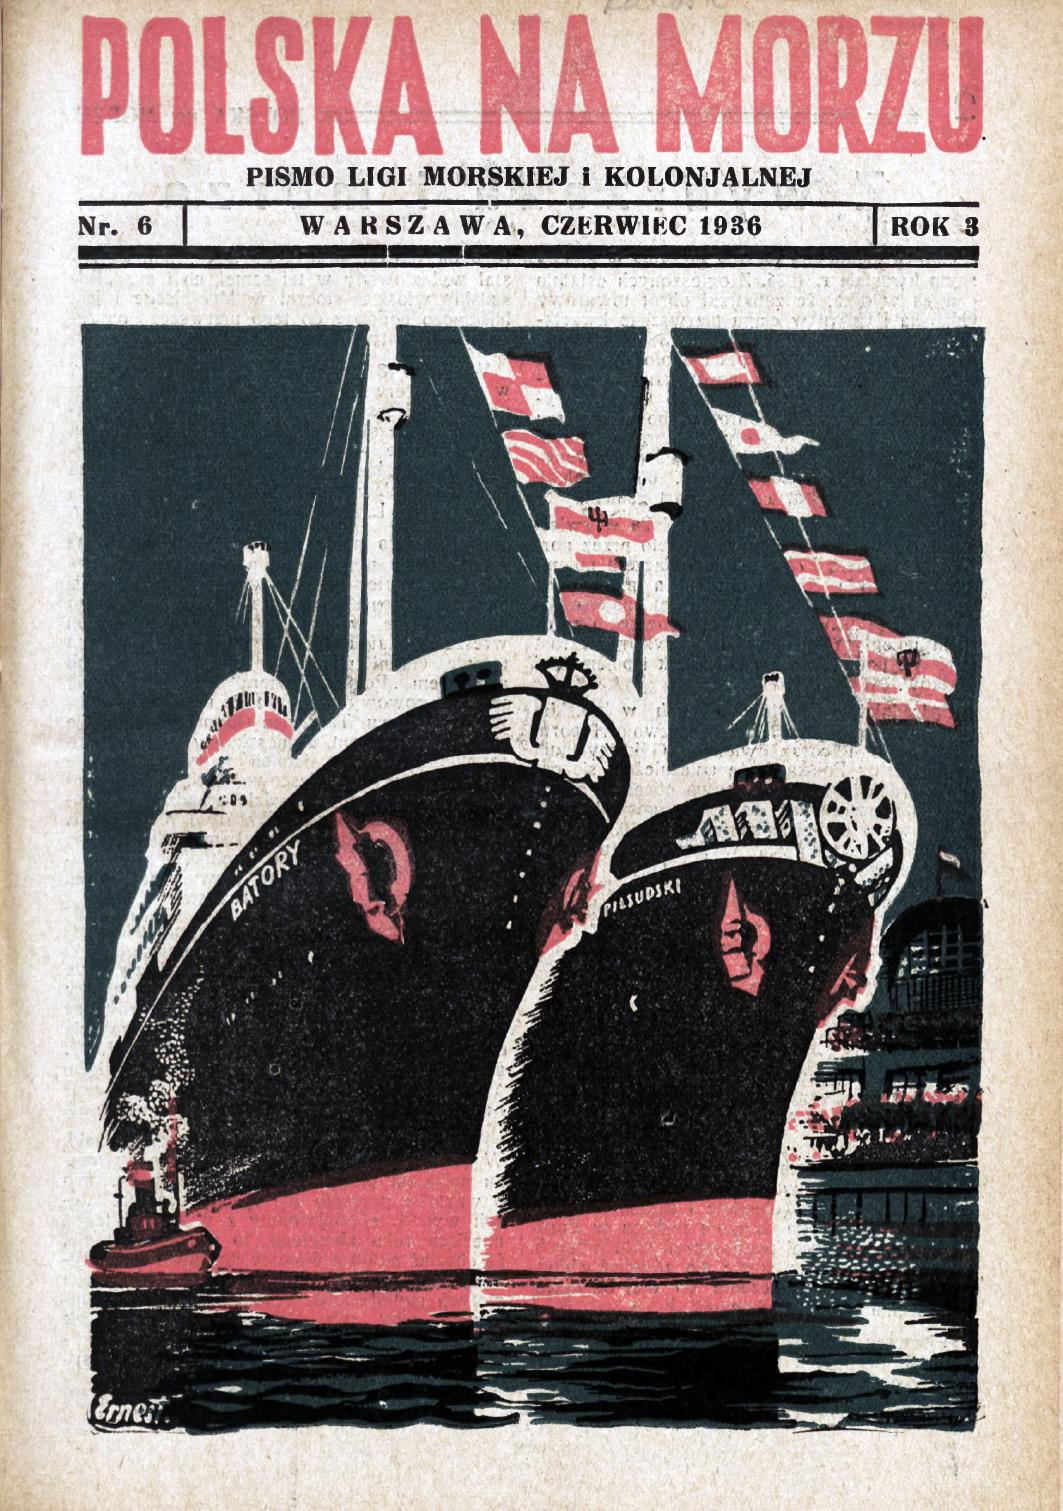 Polska na Morzu : pismo Ligi Morskiej i Kolonjalnej. - Liga Morska i Kolonjalna, 1936, nr 6